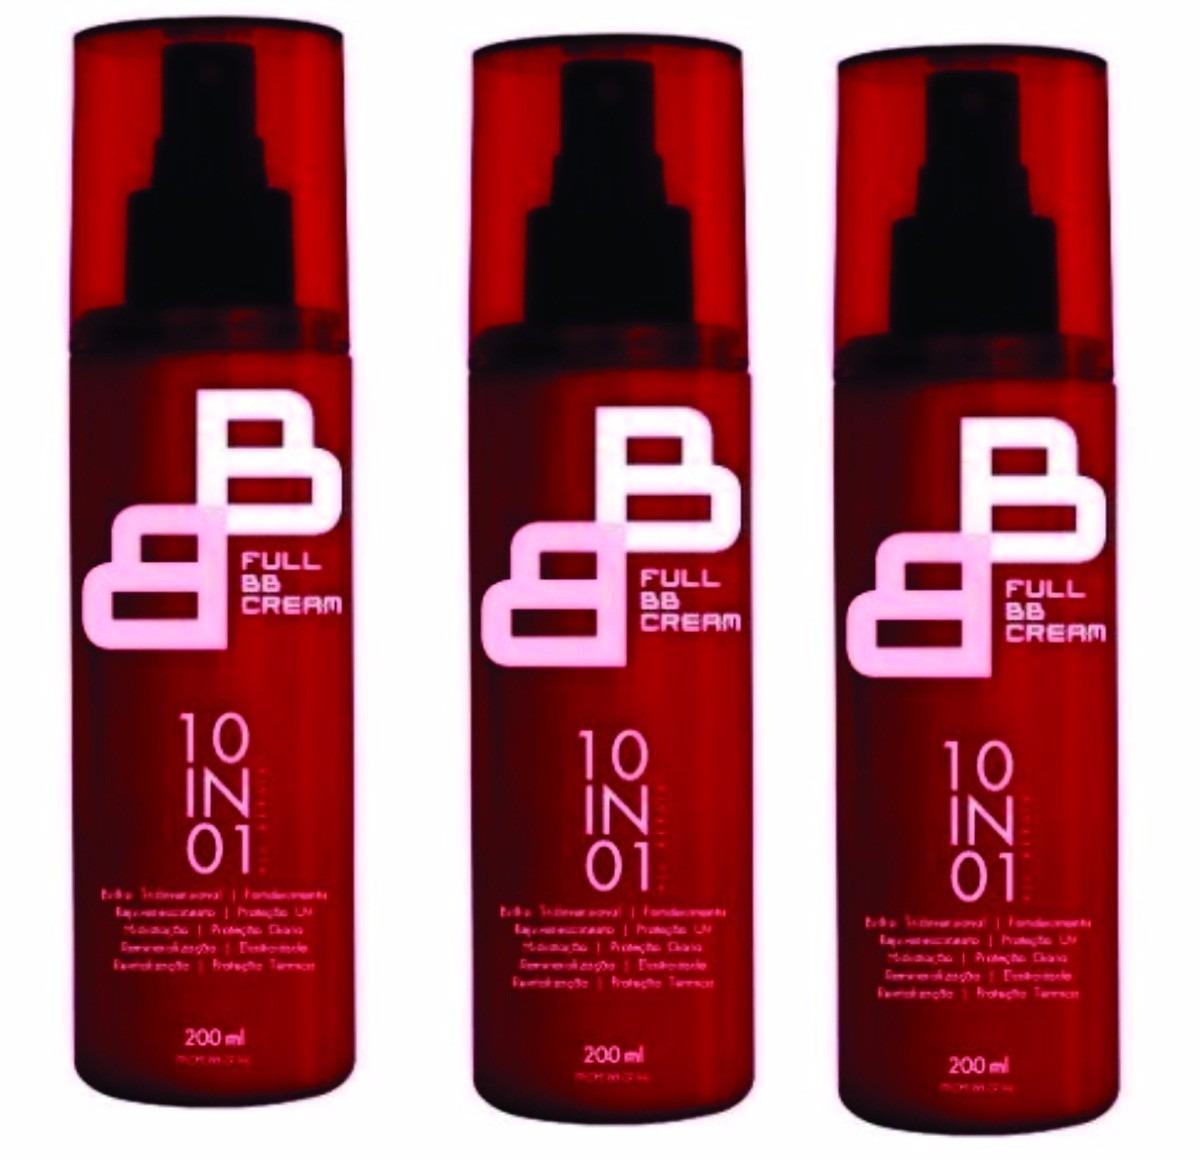 Full Bb Cream 10 Em 01 Felithi - 3 Unidades - Oferta